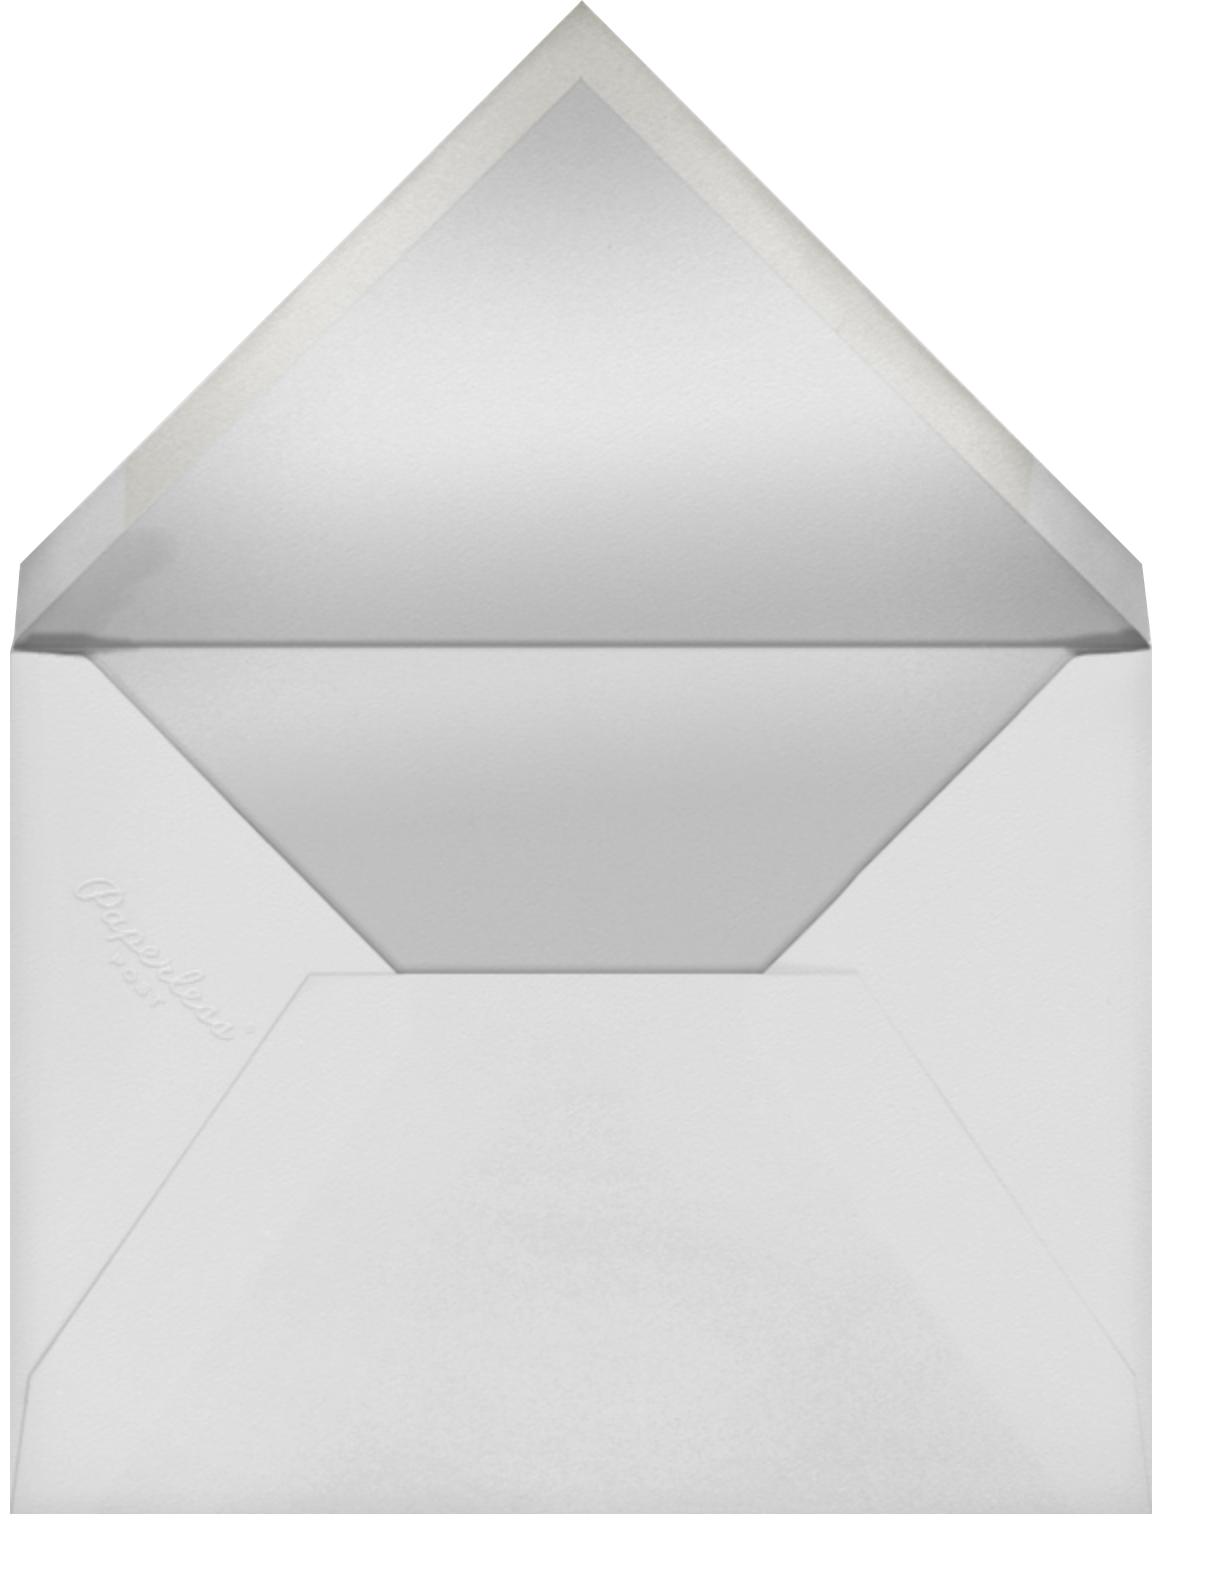 Gradient Full Horizontal - Pink - Paperless Post - Bachelorette party - envelope back